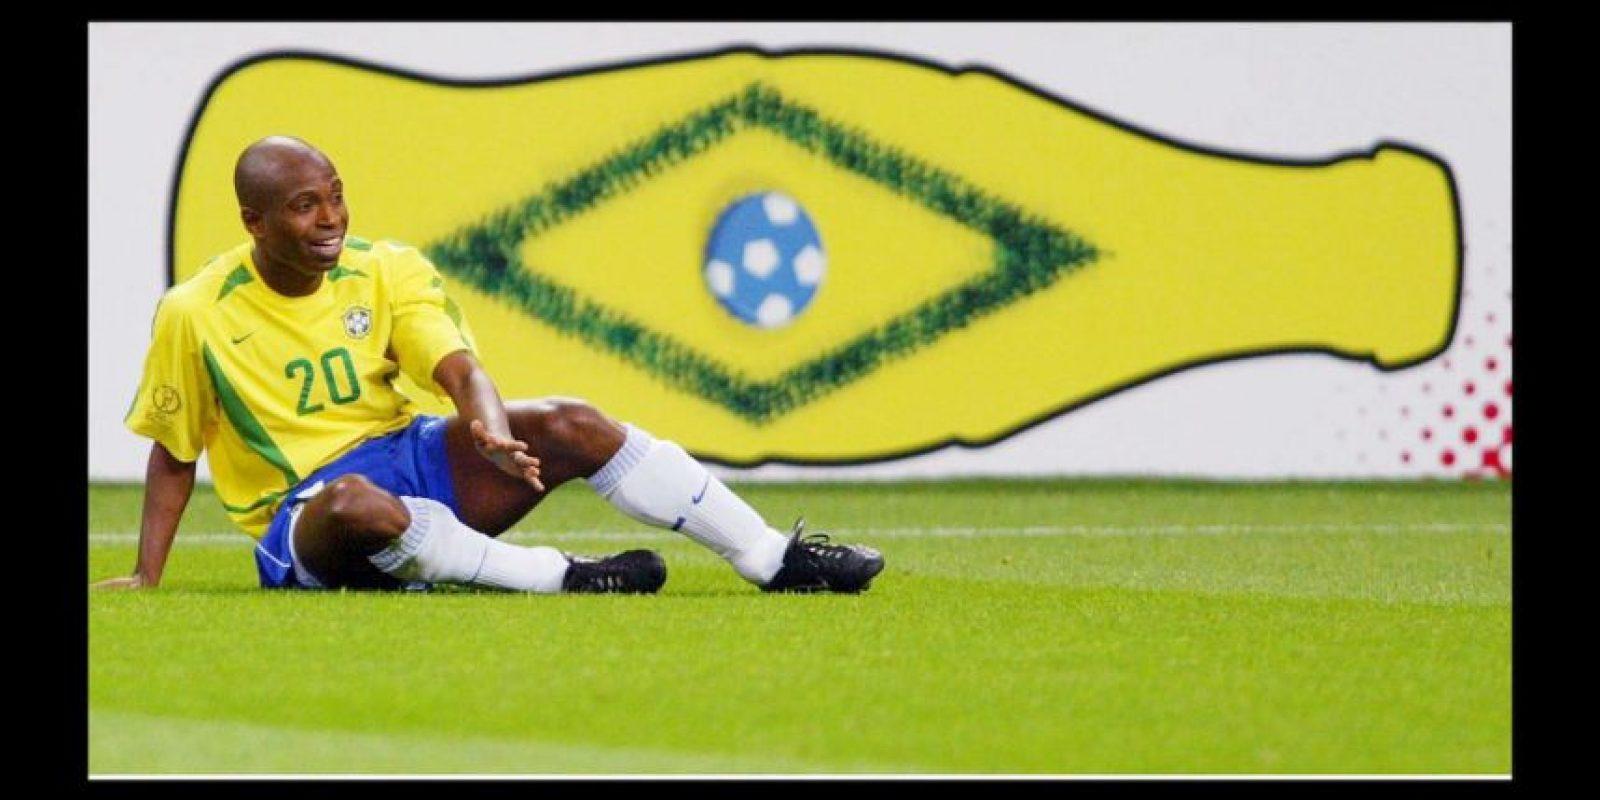 Edilson da Silva Ferreira fue campeón del mundo en 2002 con Brasil Foto:Getty Images